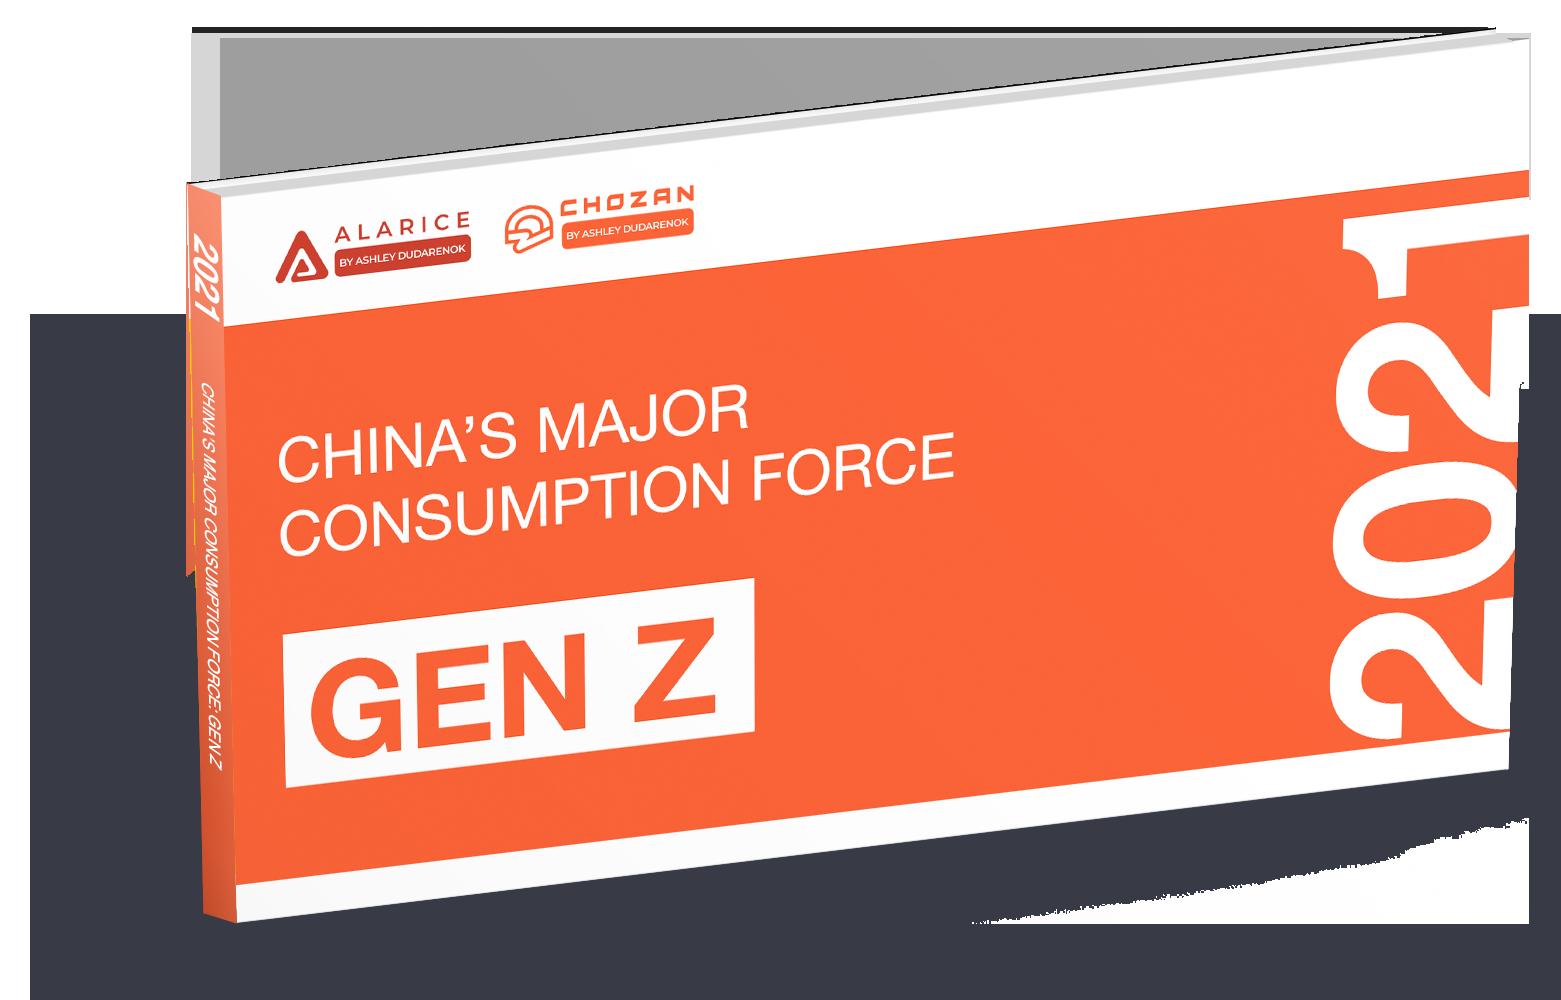 China's major consumption force: Gen Z